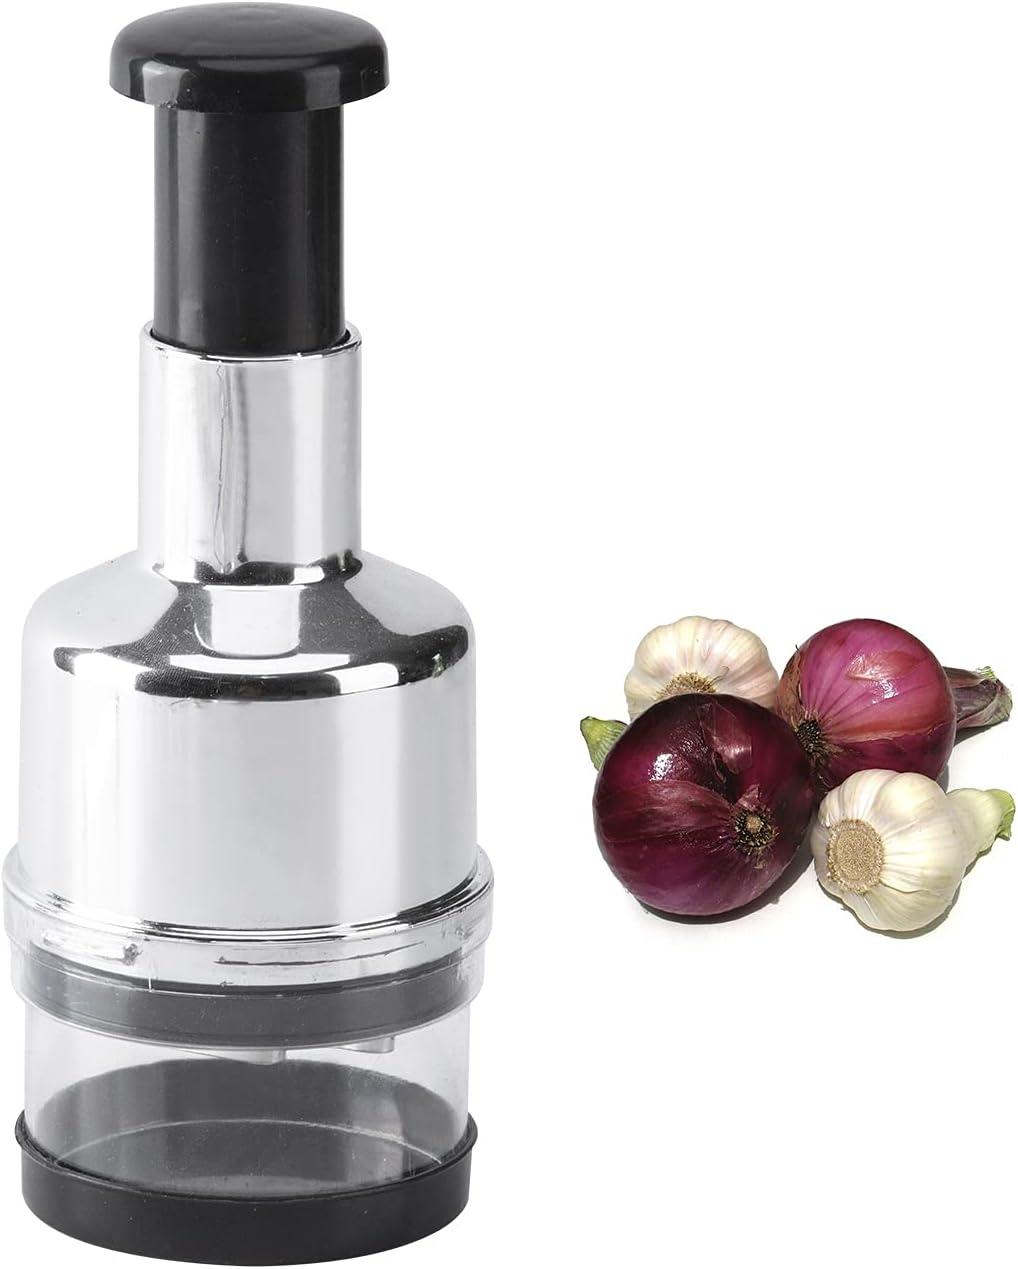 Food Chopper - Zerdie, Multi-Function Mincer, Manual Hand Dicer, Onion Chopper, Garlic Crusher, Vegetable Slicer, Fruit Cutter